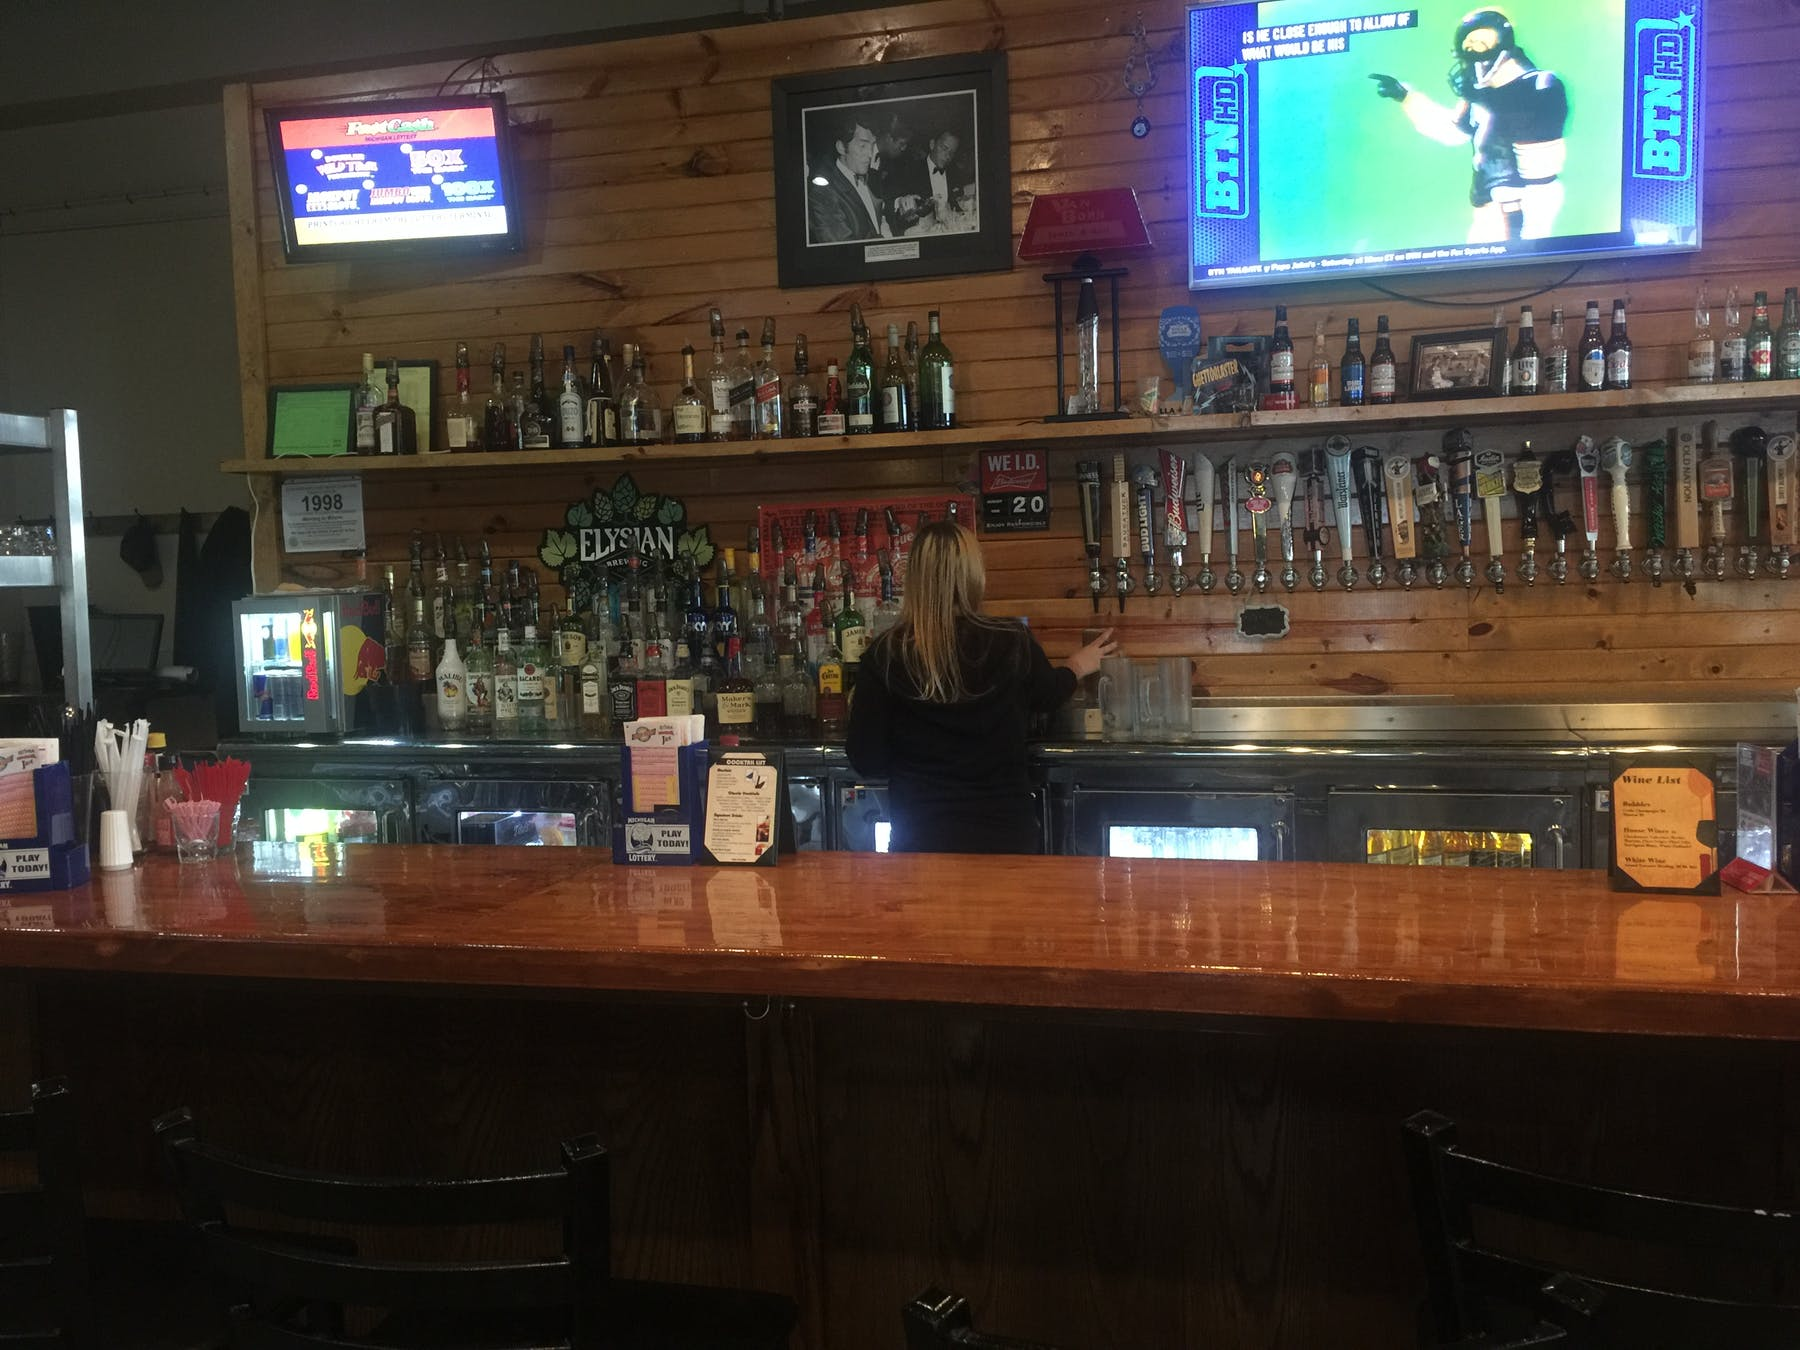 a bar with a bartender